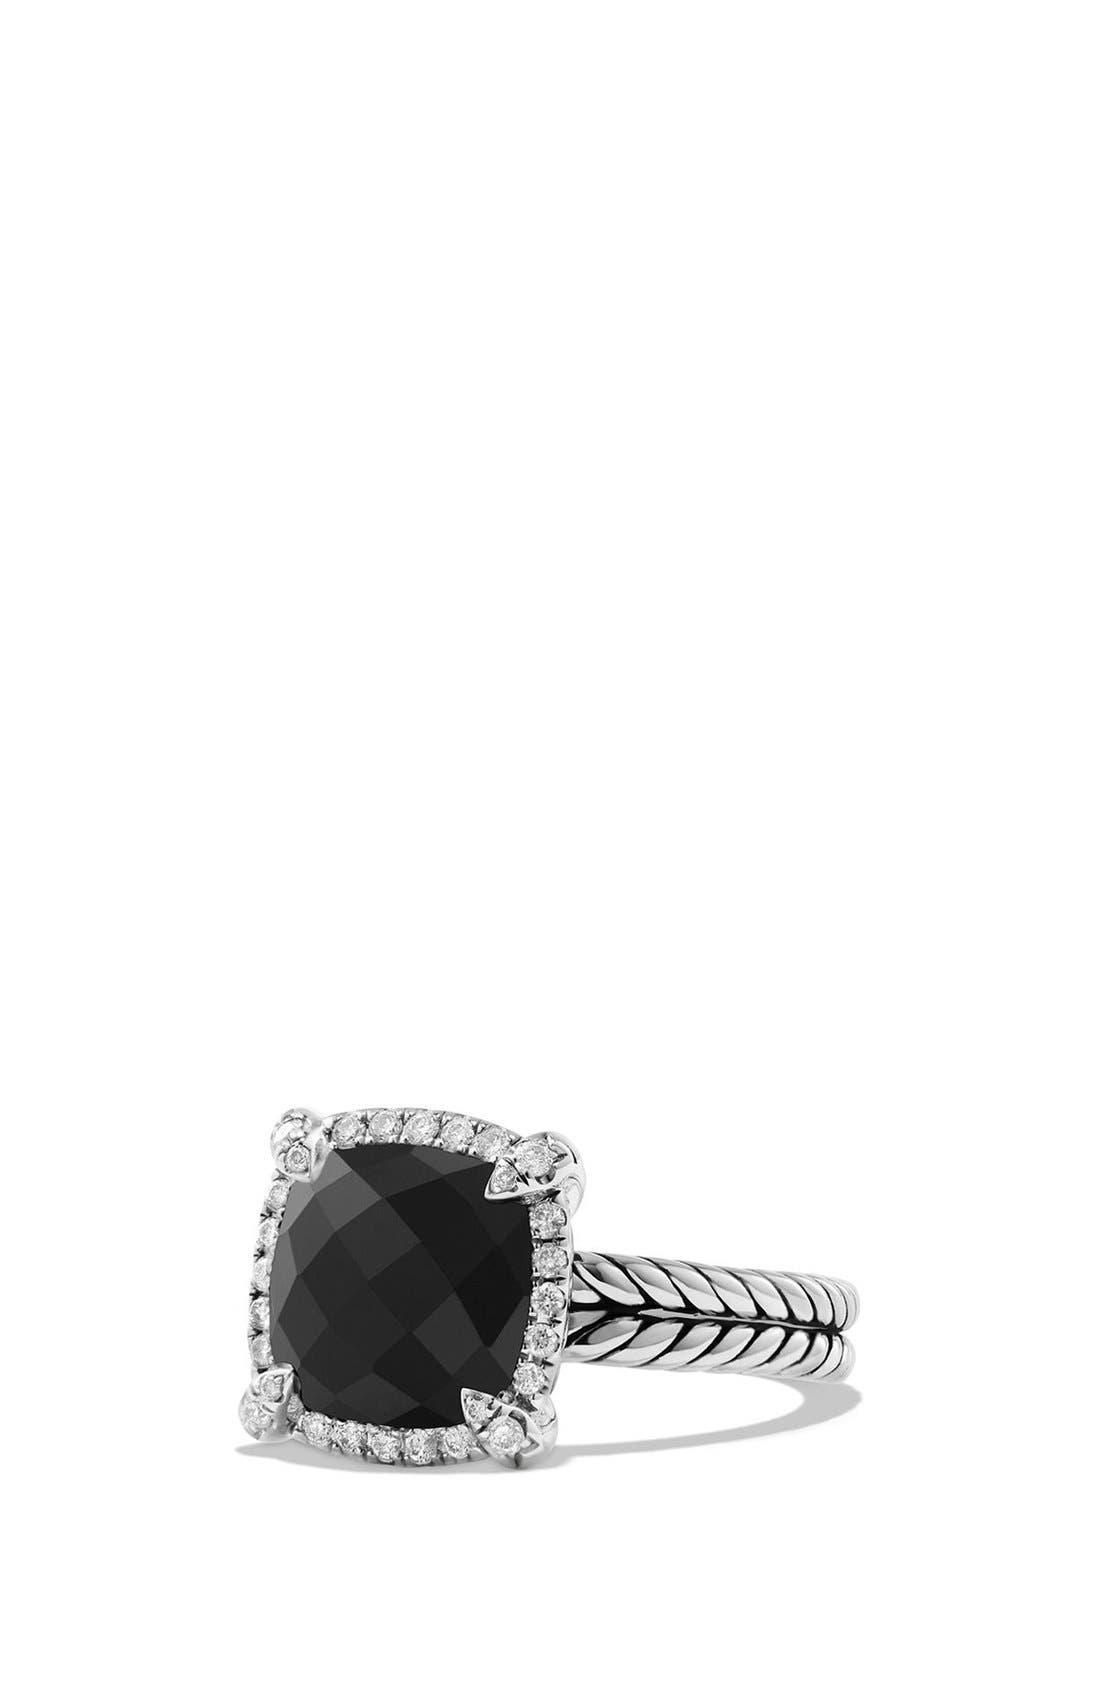 'Châtelaine' Small Pavé Bezel Ring with Diamonds,                             Main thumbnail 1, color,                             BLACK ONYX